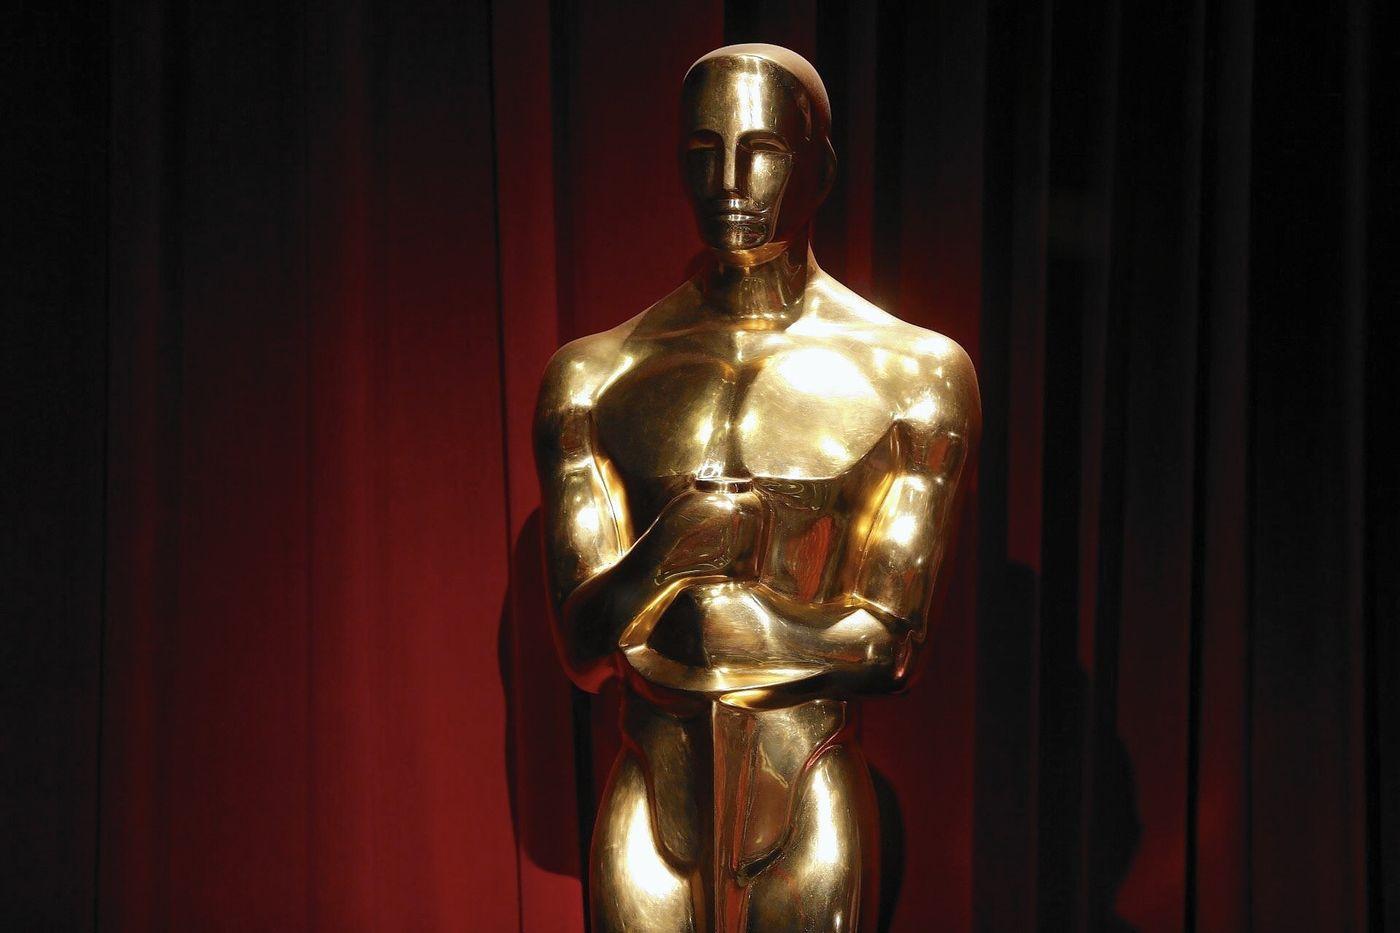 academy awards odds 2019